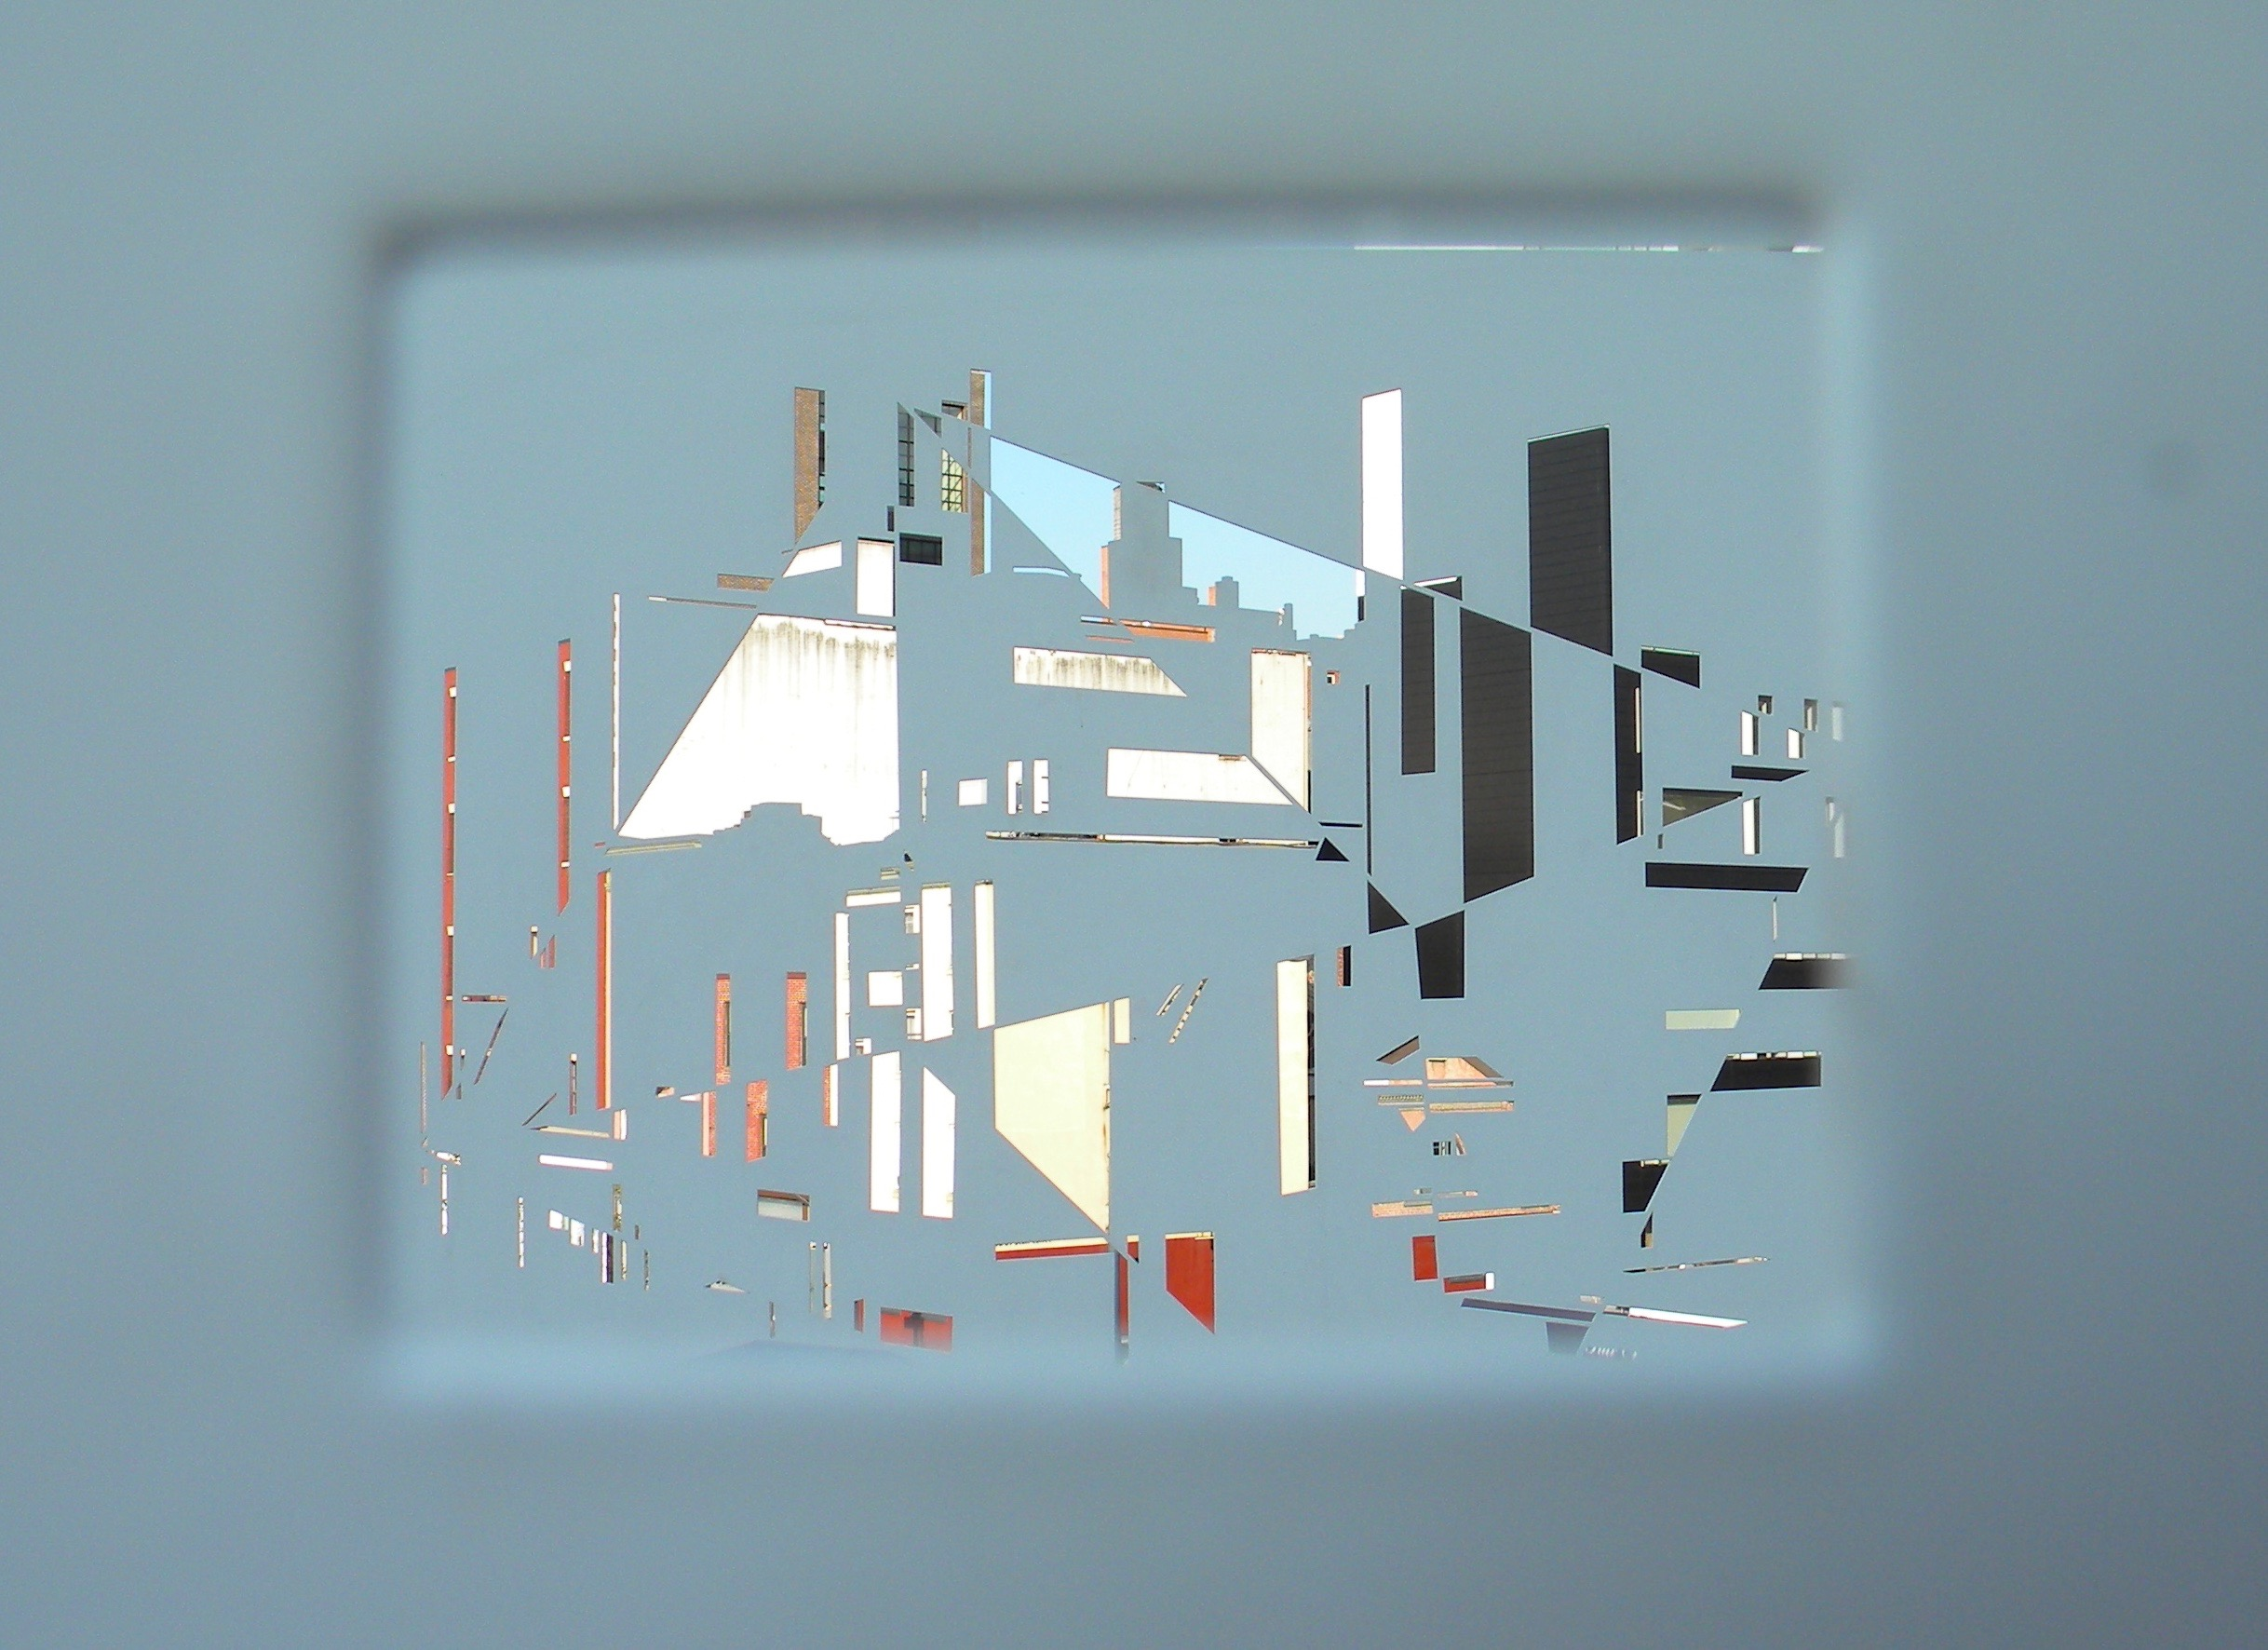 Kaleidoskop: Titel taz.blog